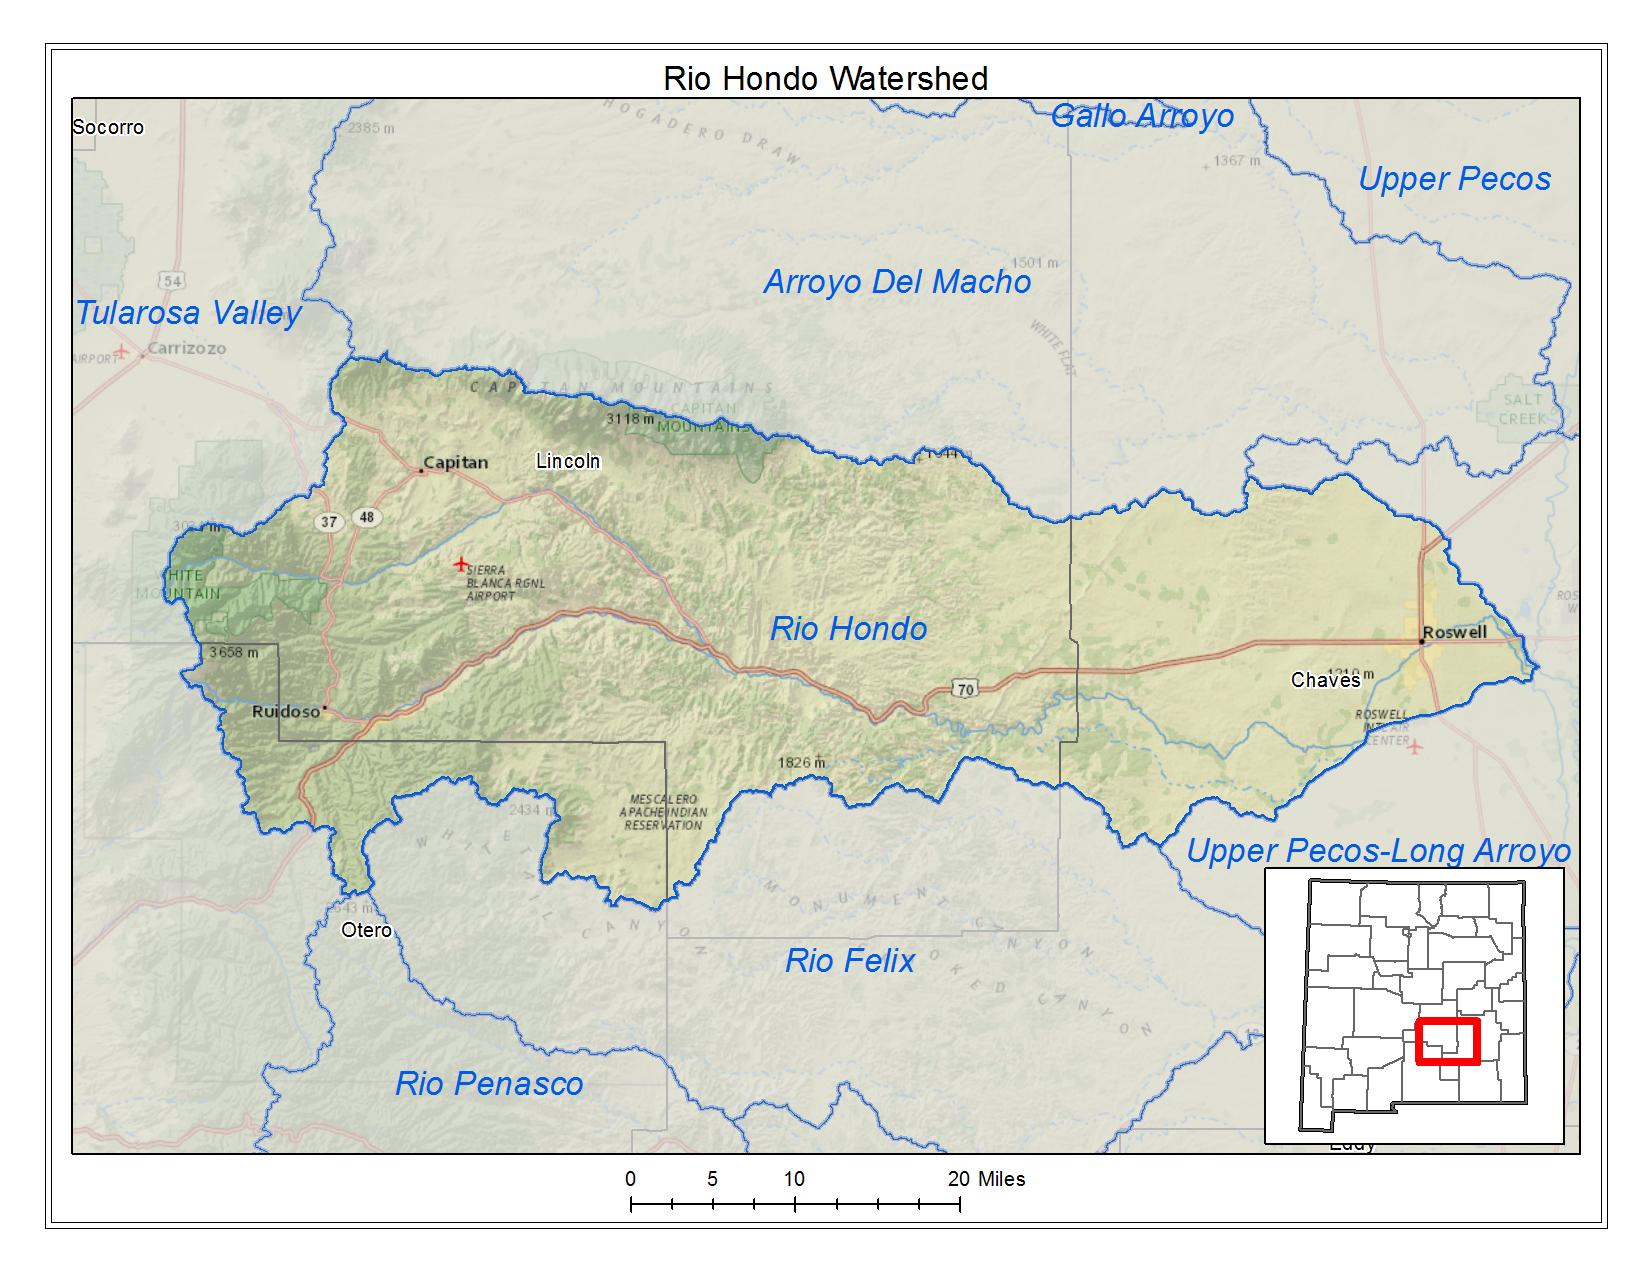 Rio Hondo Watershed